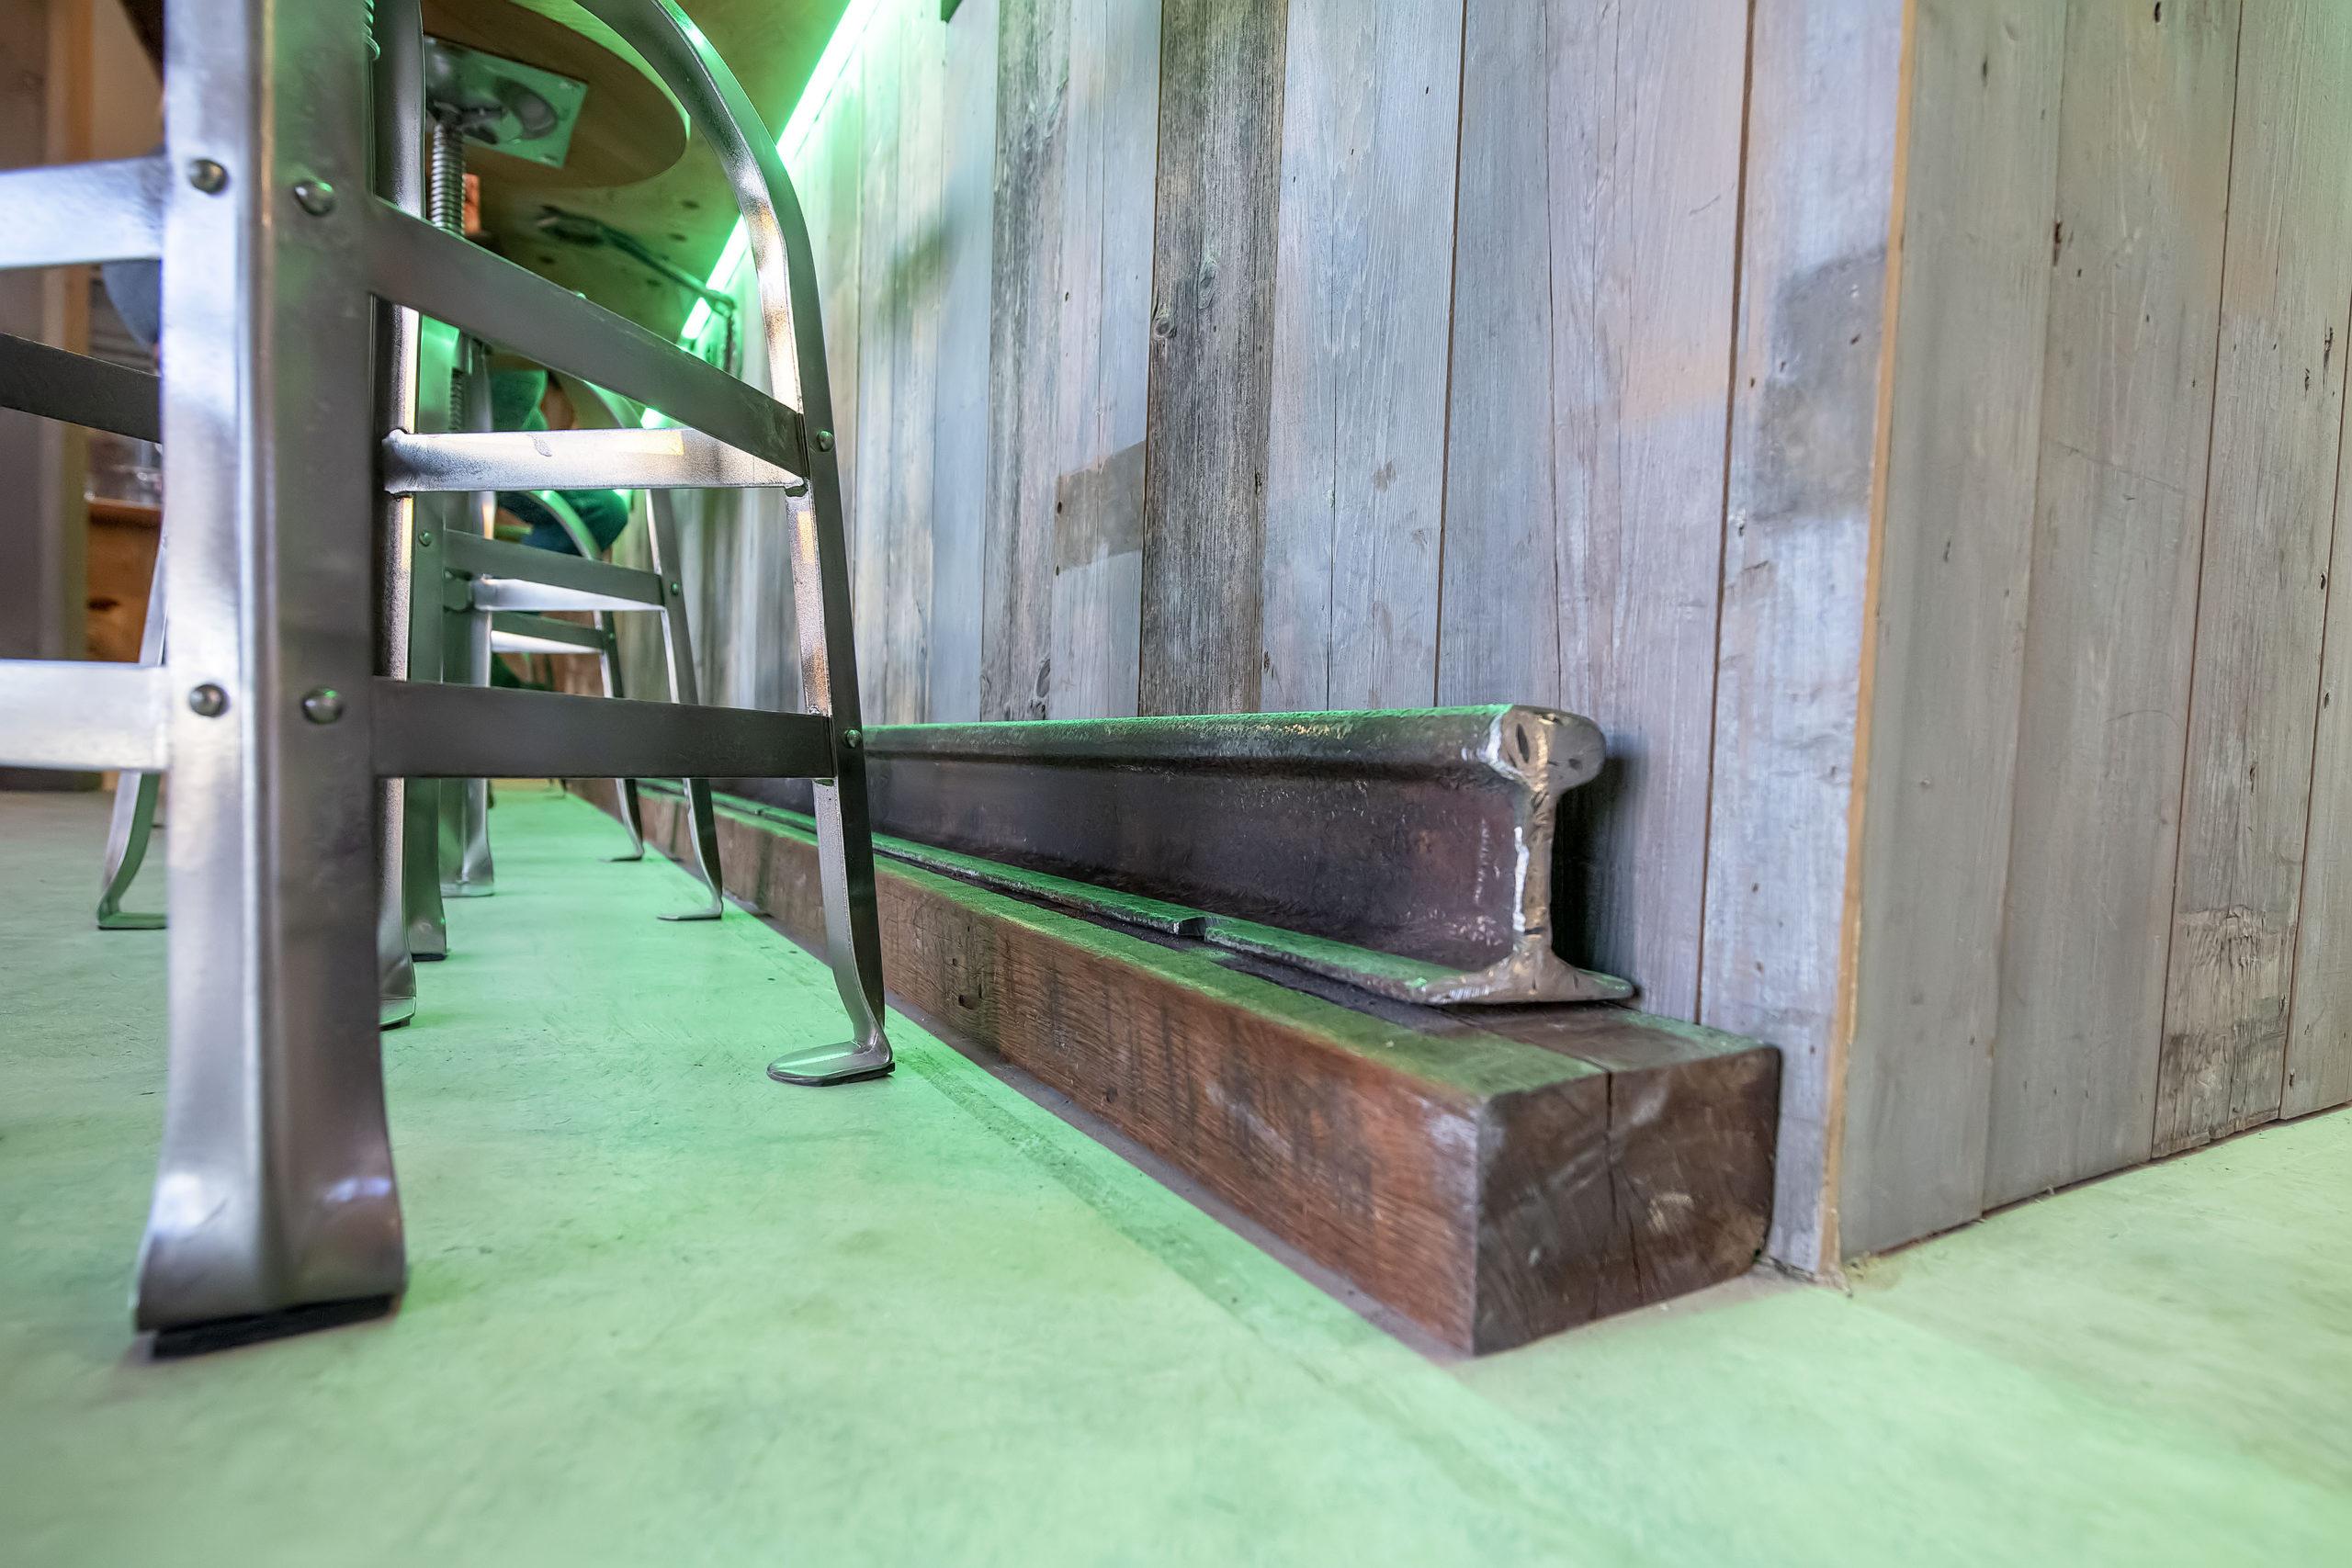 The bar rail was originally used on the track that ran between Sag Harbor and Bridgehampton. MICHAEL HELLER